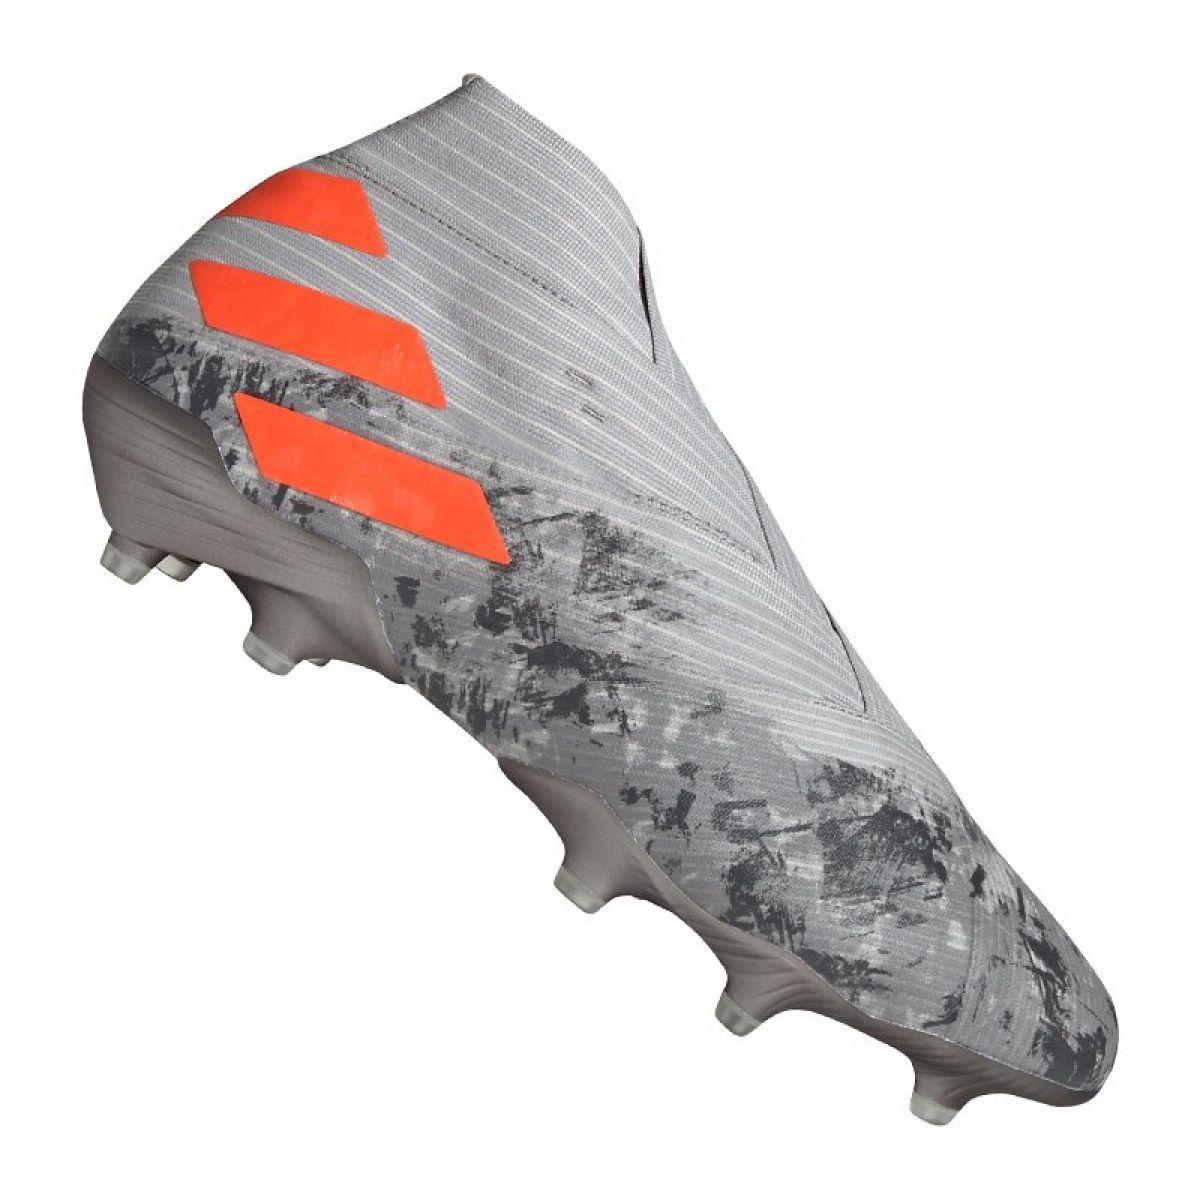 Buty Pilkarskie Adidas Nemeziz 19 Fg M Ef8280 Szare Szare Football Shoes Football Adidas